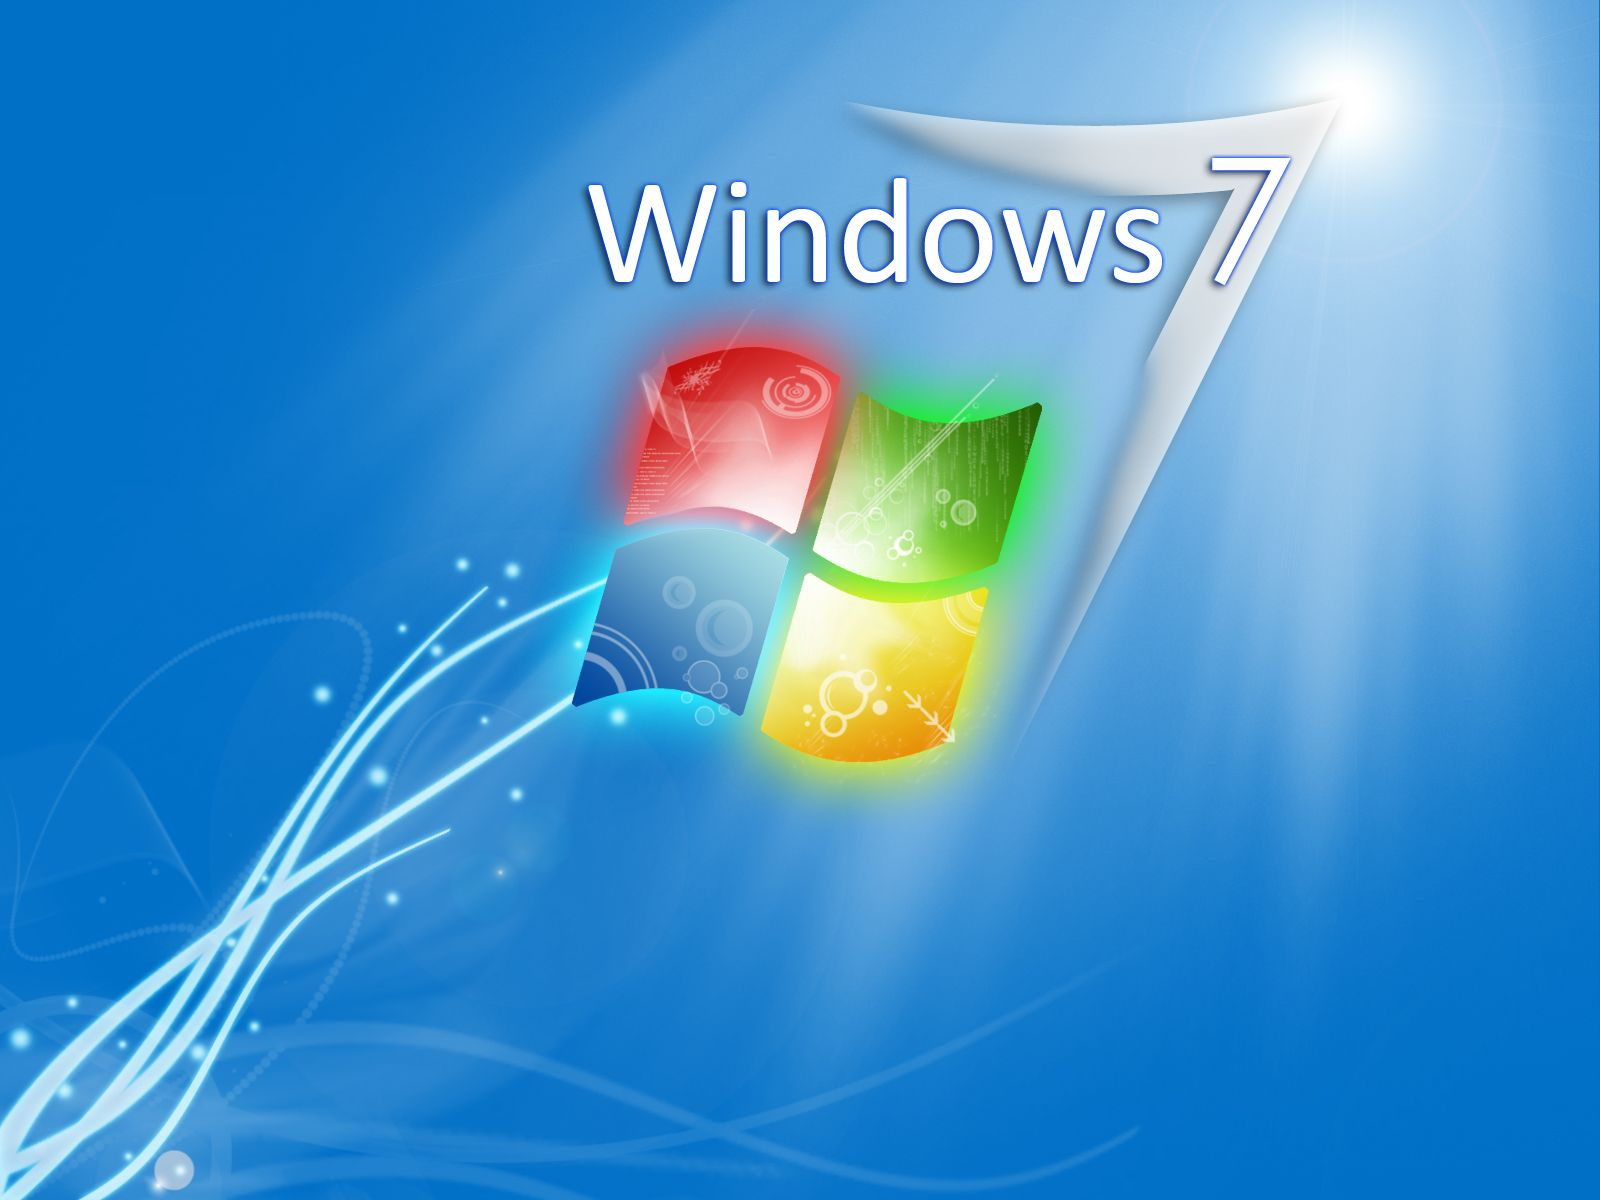 Download The Free Desktop Wallpaper Of Windows 7 Wallpapers Hd Win Windows Desktop Wallpaper Wallpaper Pc New Wallpaper Hd